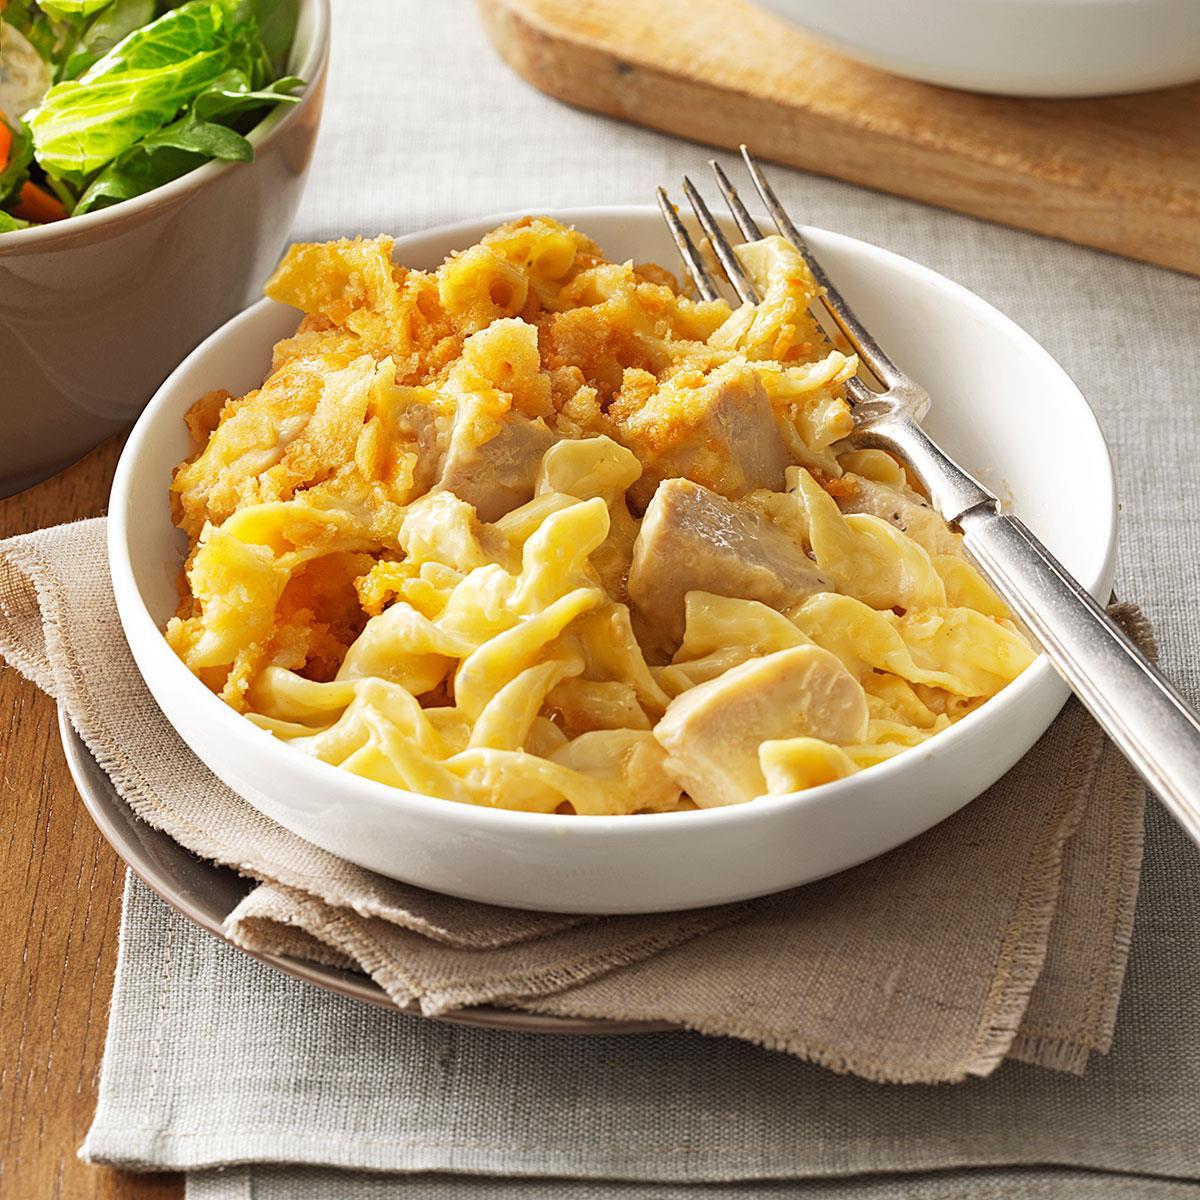 Best Chicken & Egg Noodle Casserole